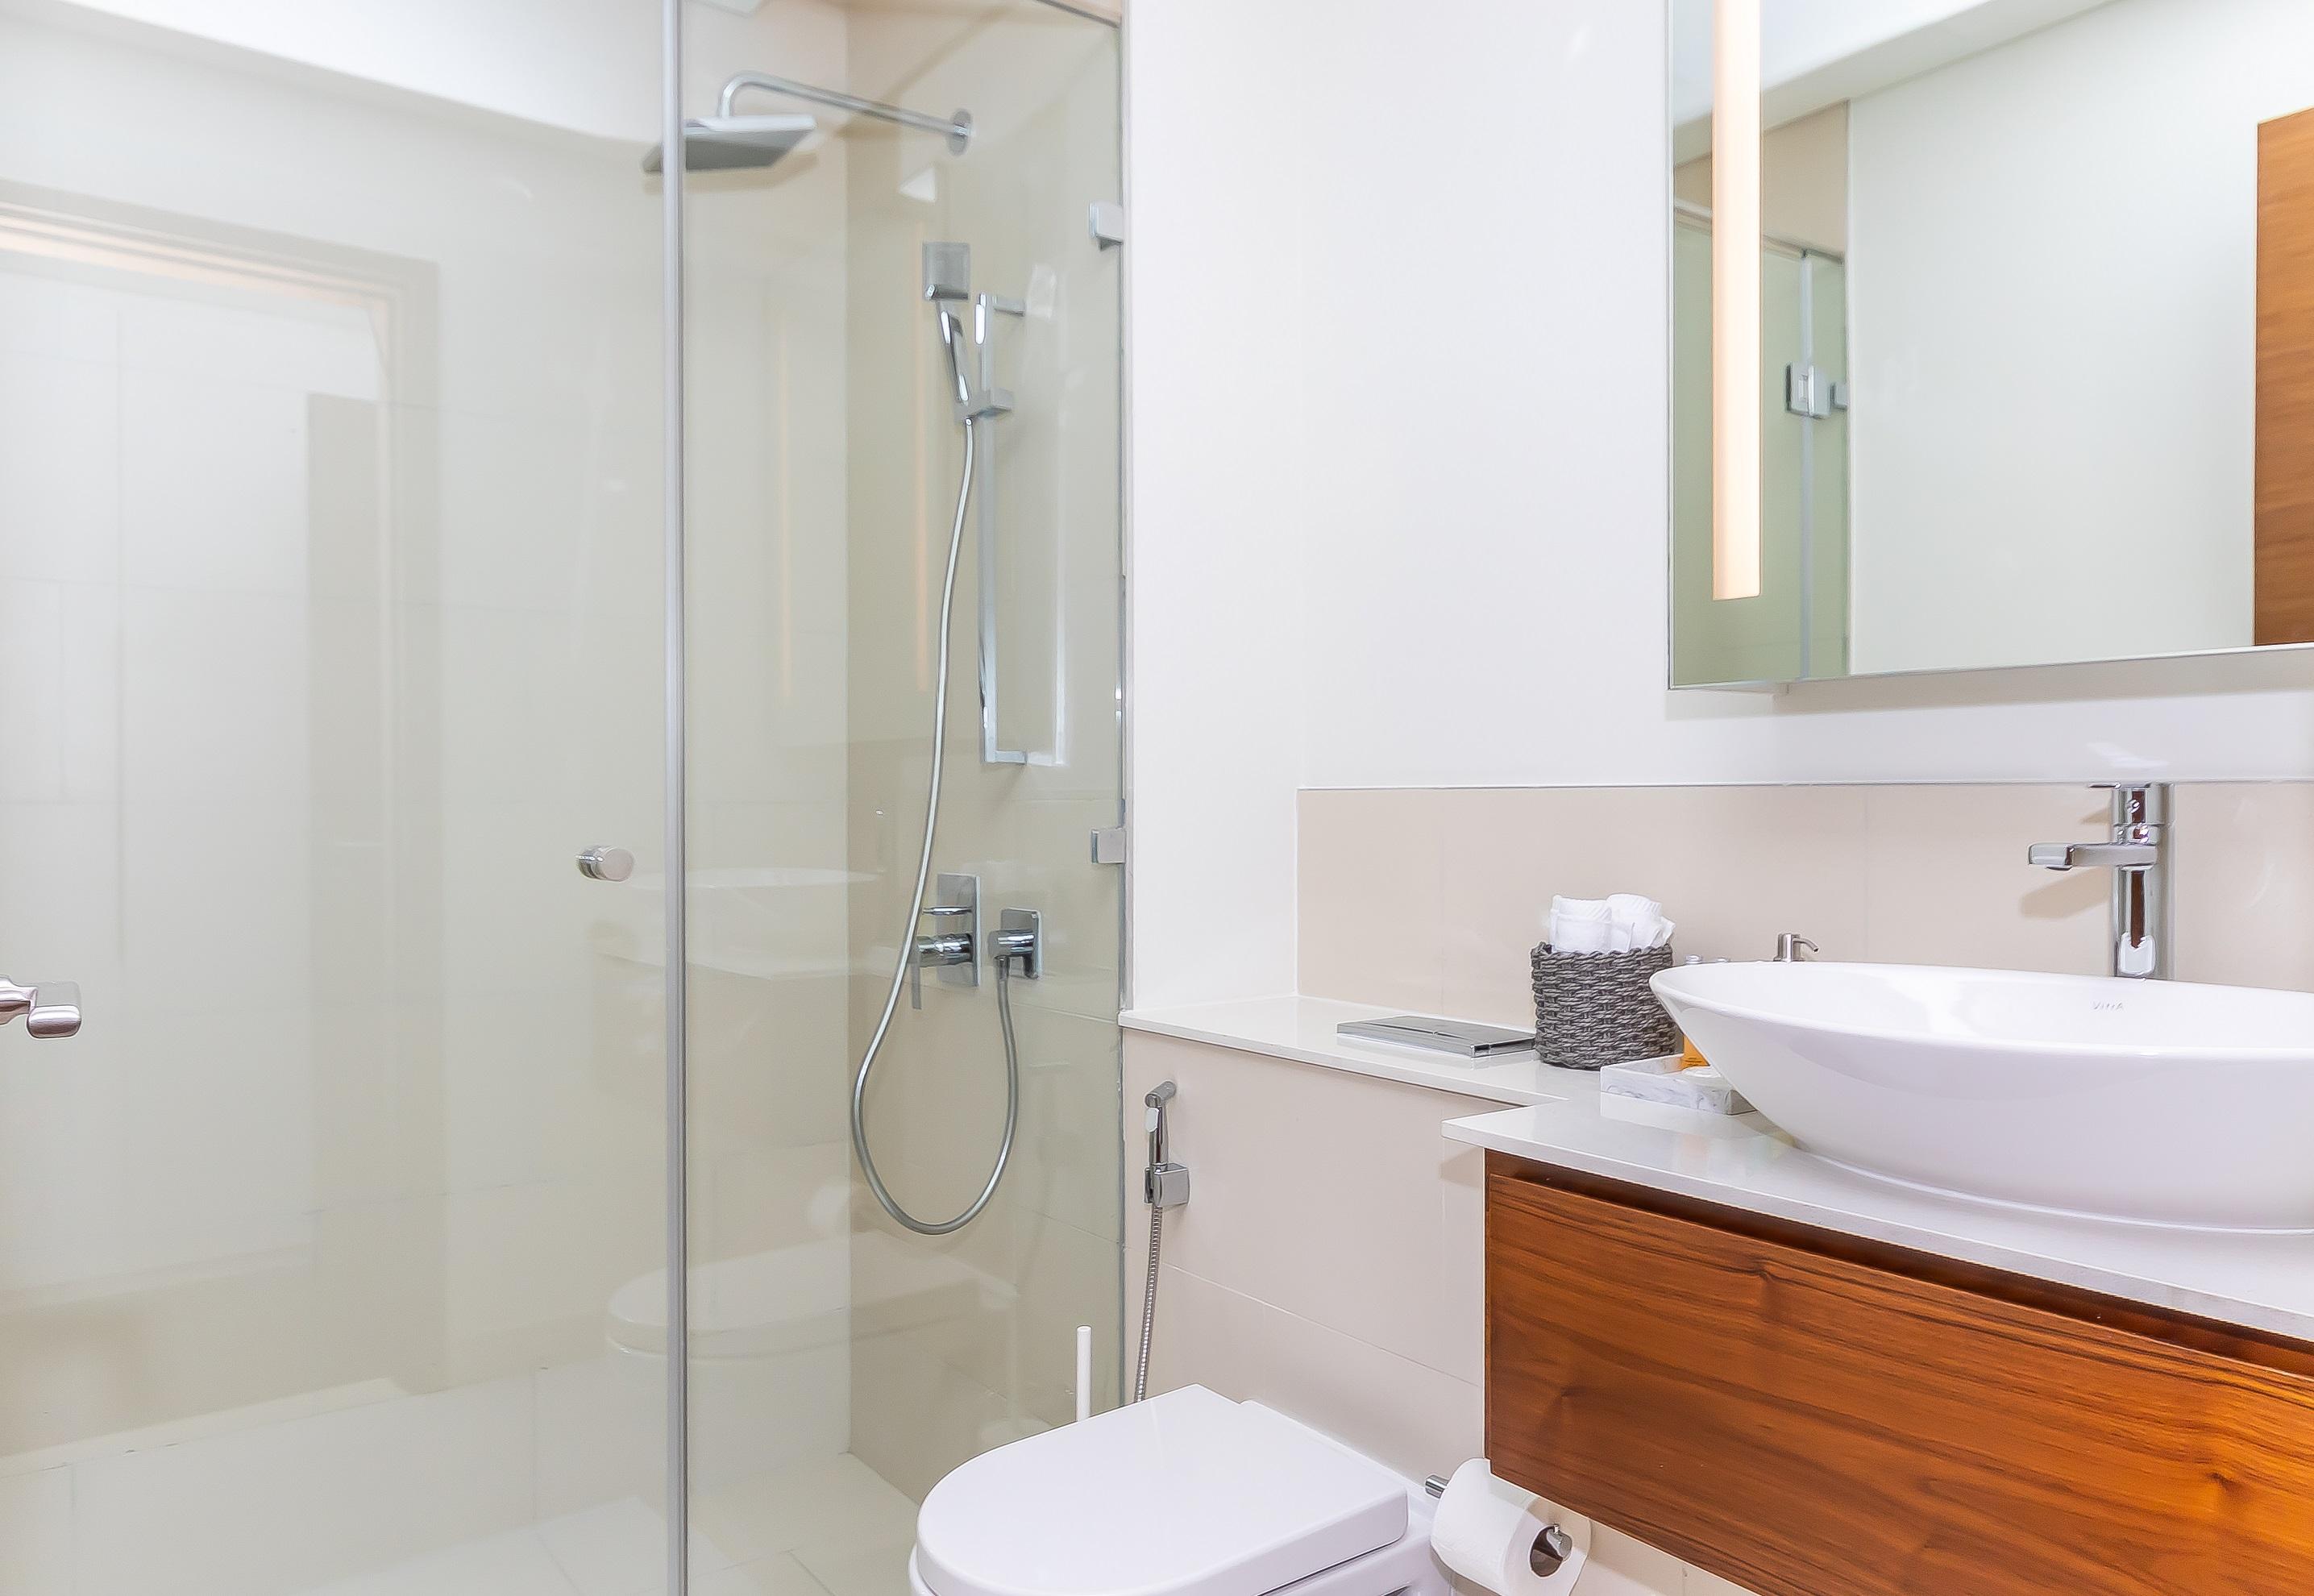 Apartment  Remarkable Value   Unbeatable Location  3 Beds City Walk B 10 309 photo 24142310